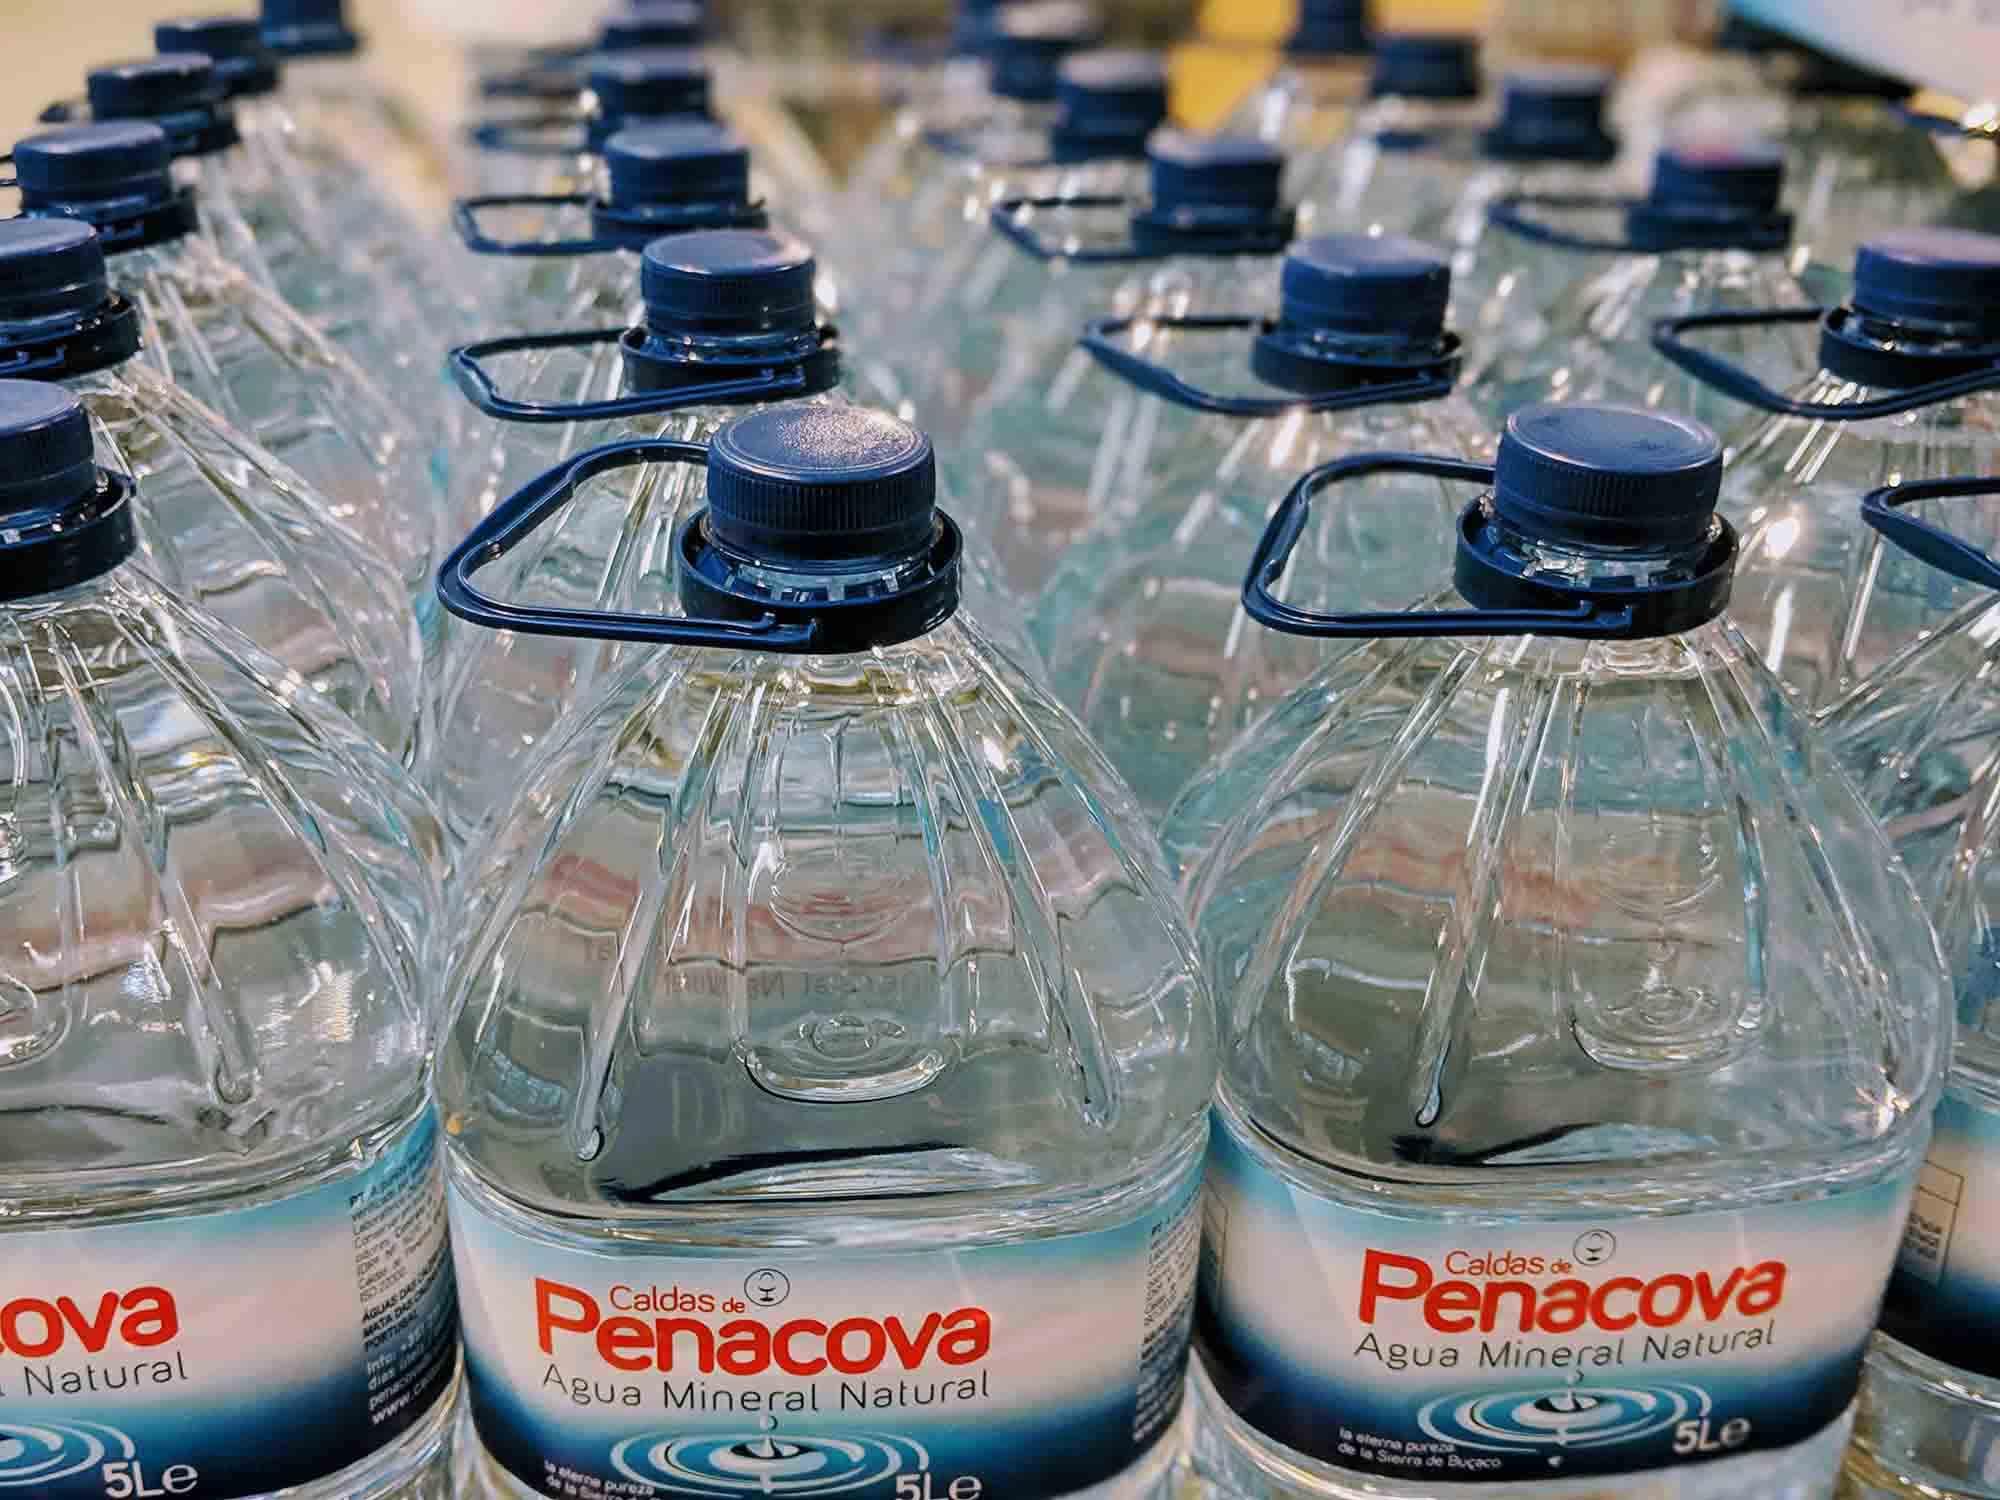 Portuguese bottled water